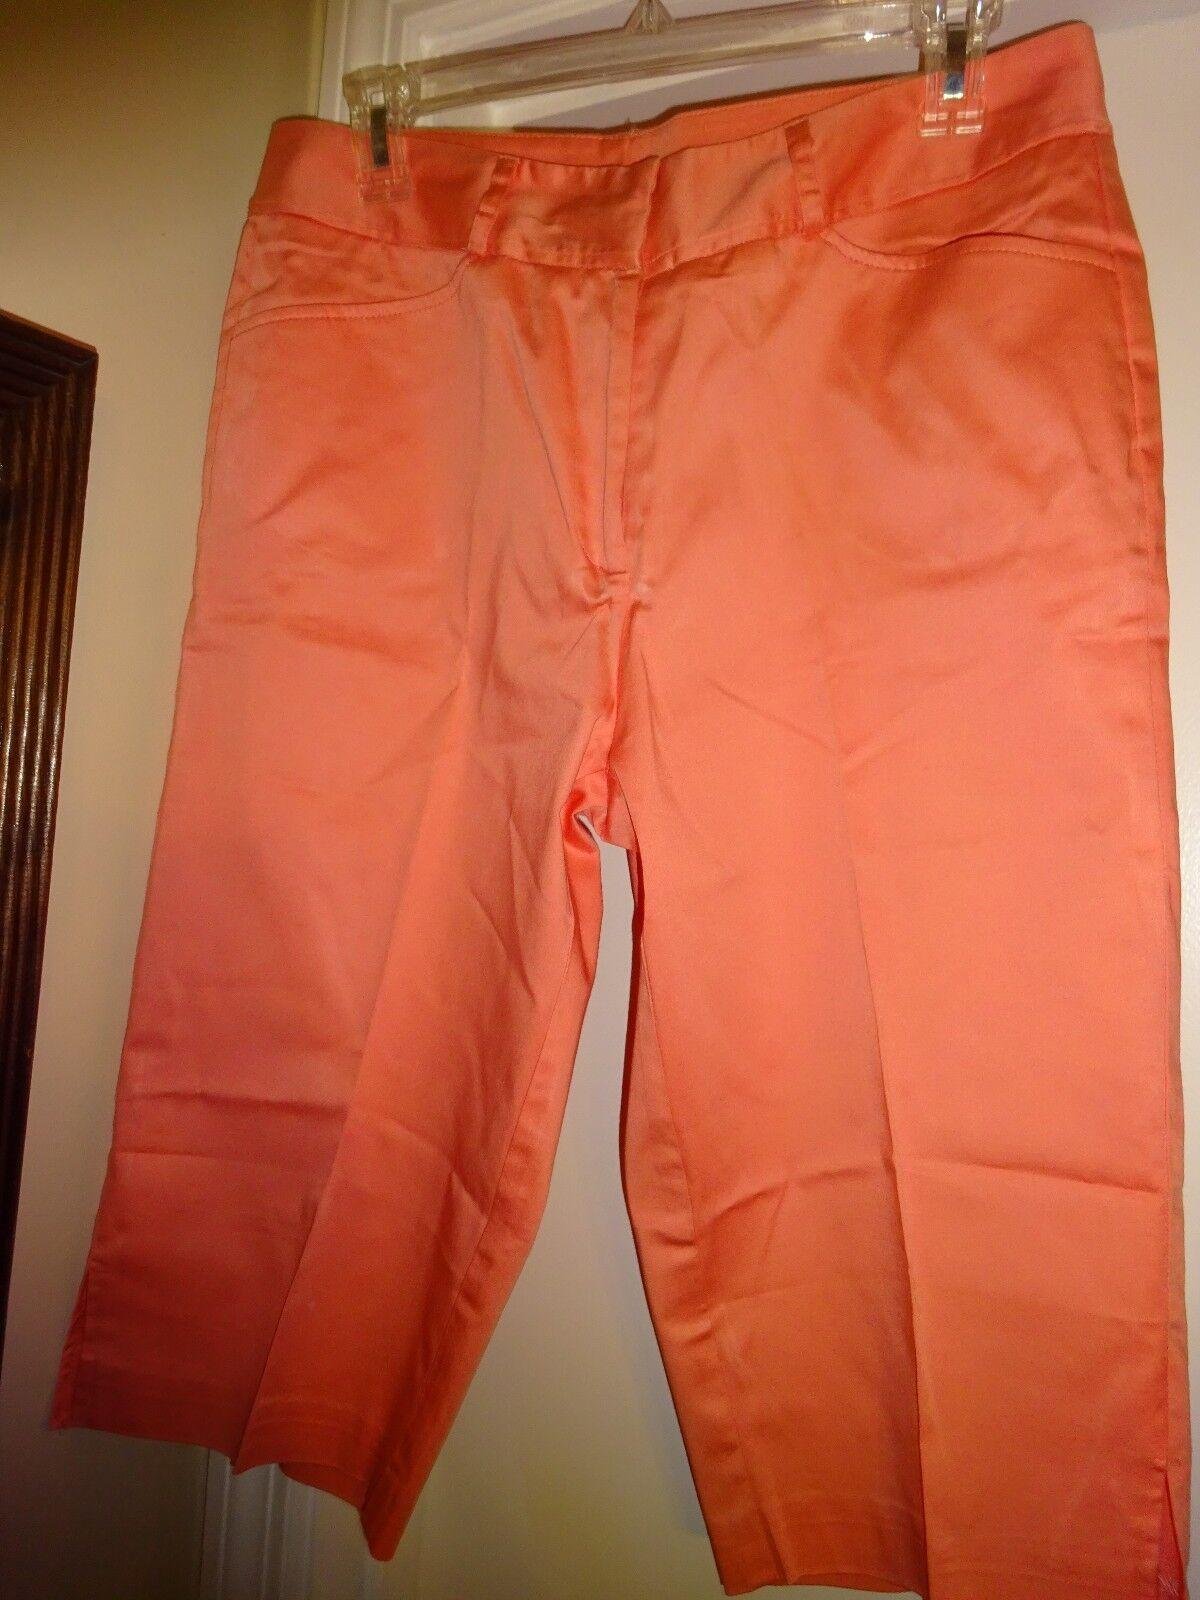 La Vita Capri Capri's Light orange Sz 10 Cropped Pants Zip Front Cotton Spandex